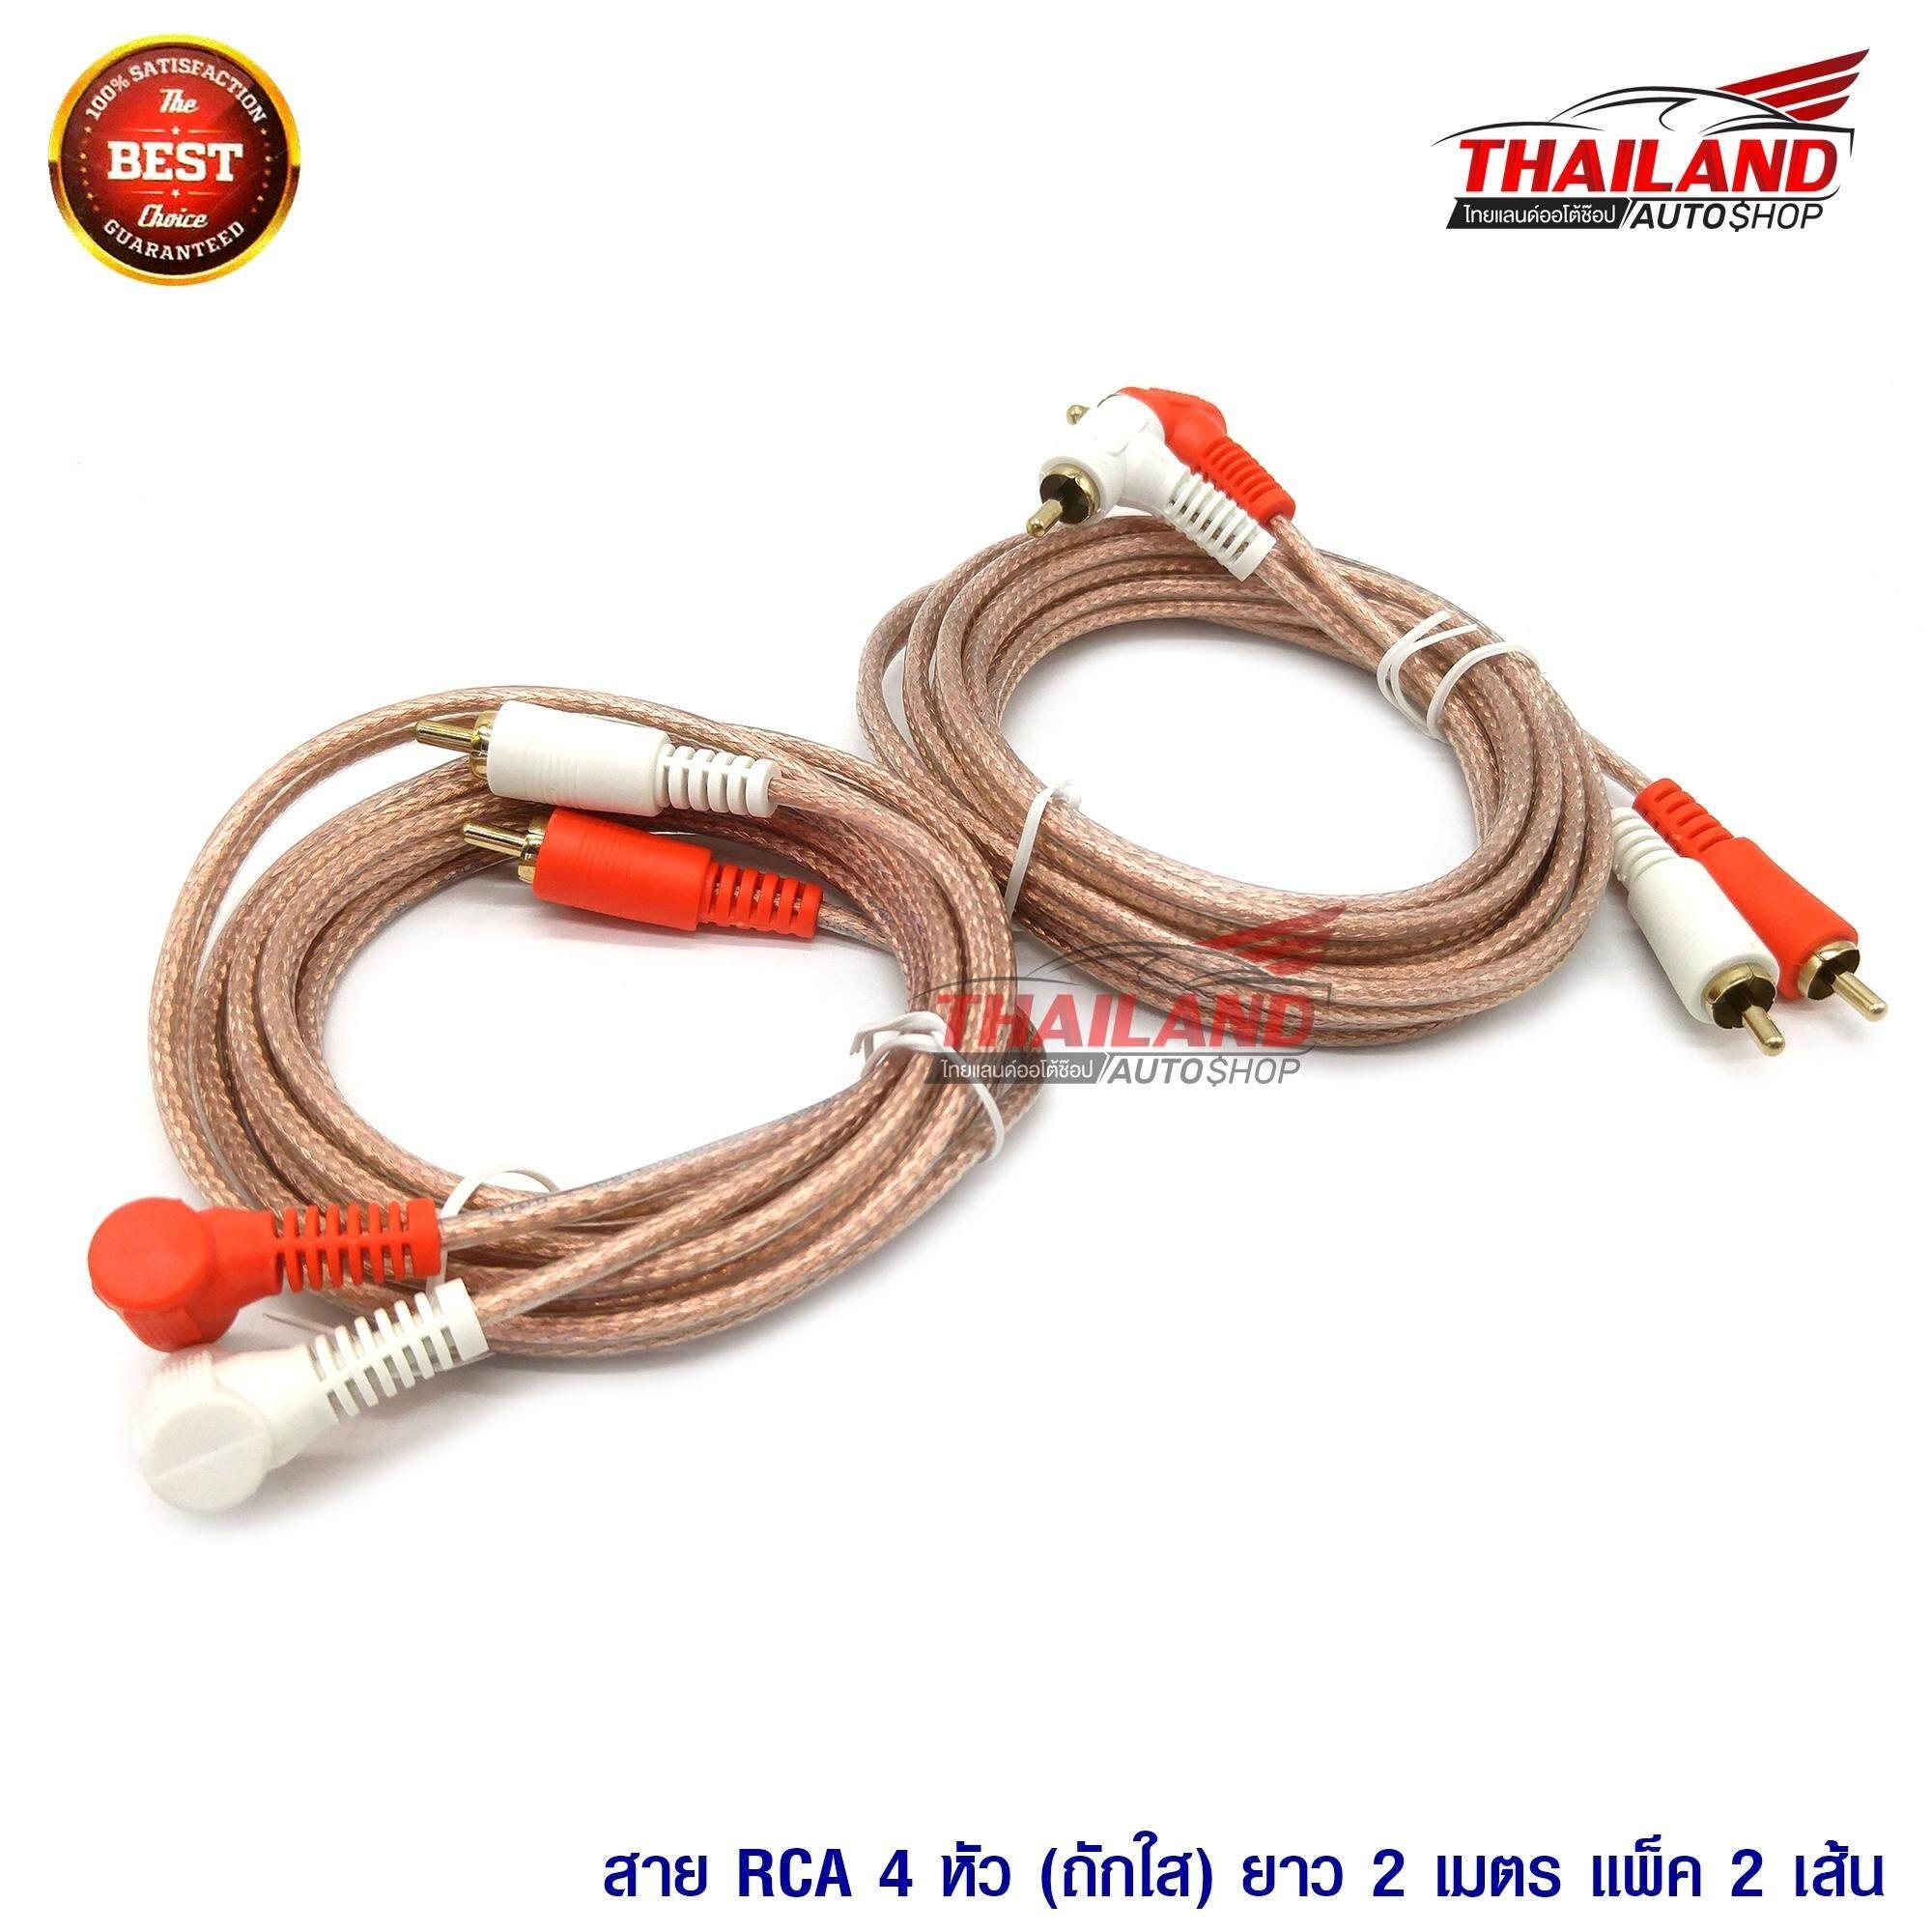 Thailand สาย Rca 4 หัว (ถักใส)  2 เมตร แพ็ค 2 เส้น.